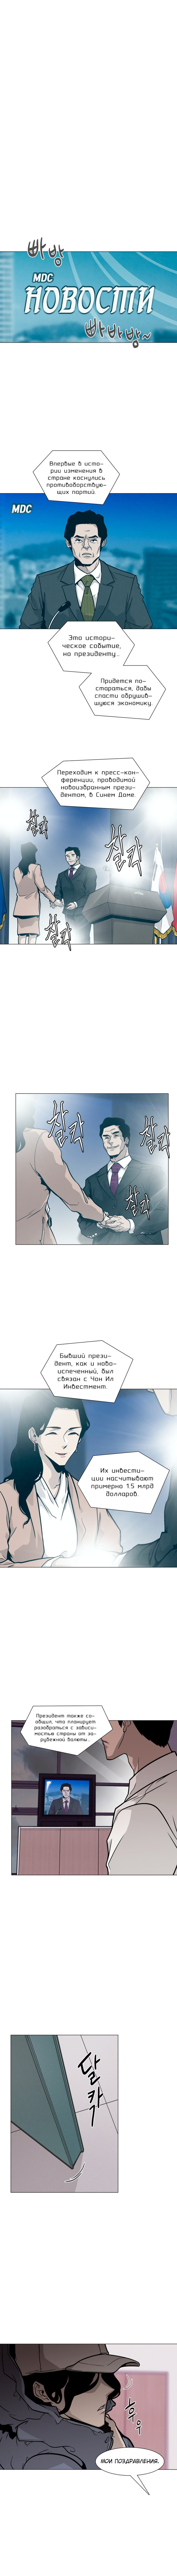 Манга Человек из прошлого - Глава 18 Страница 1